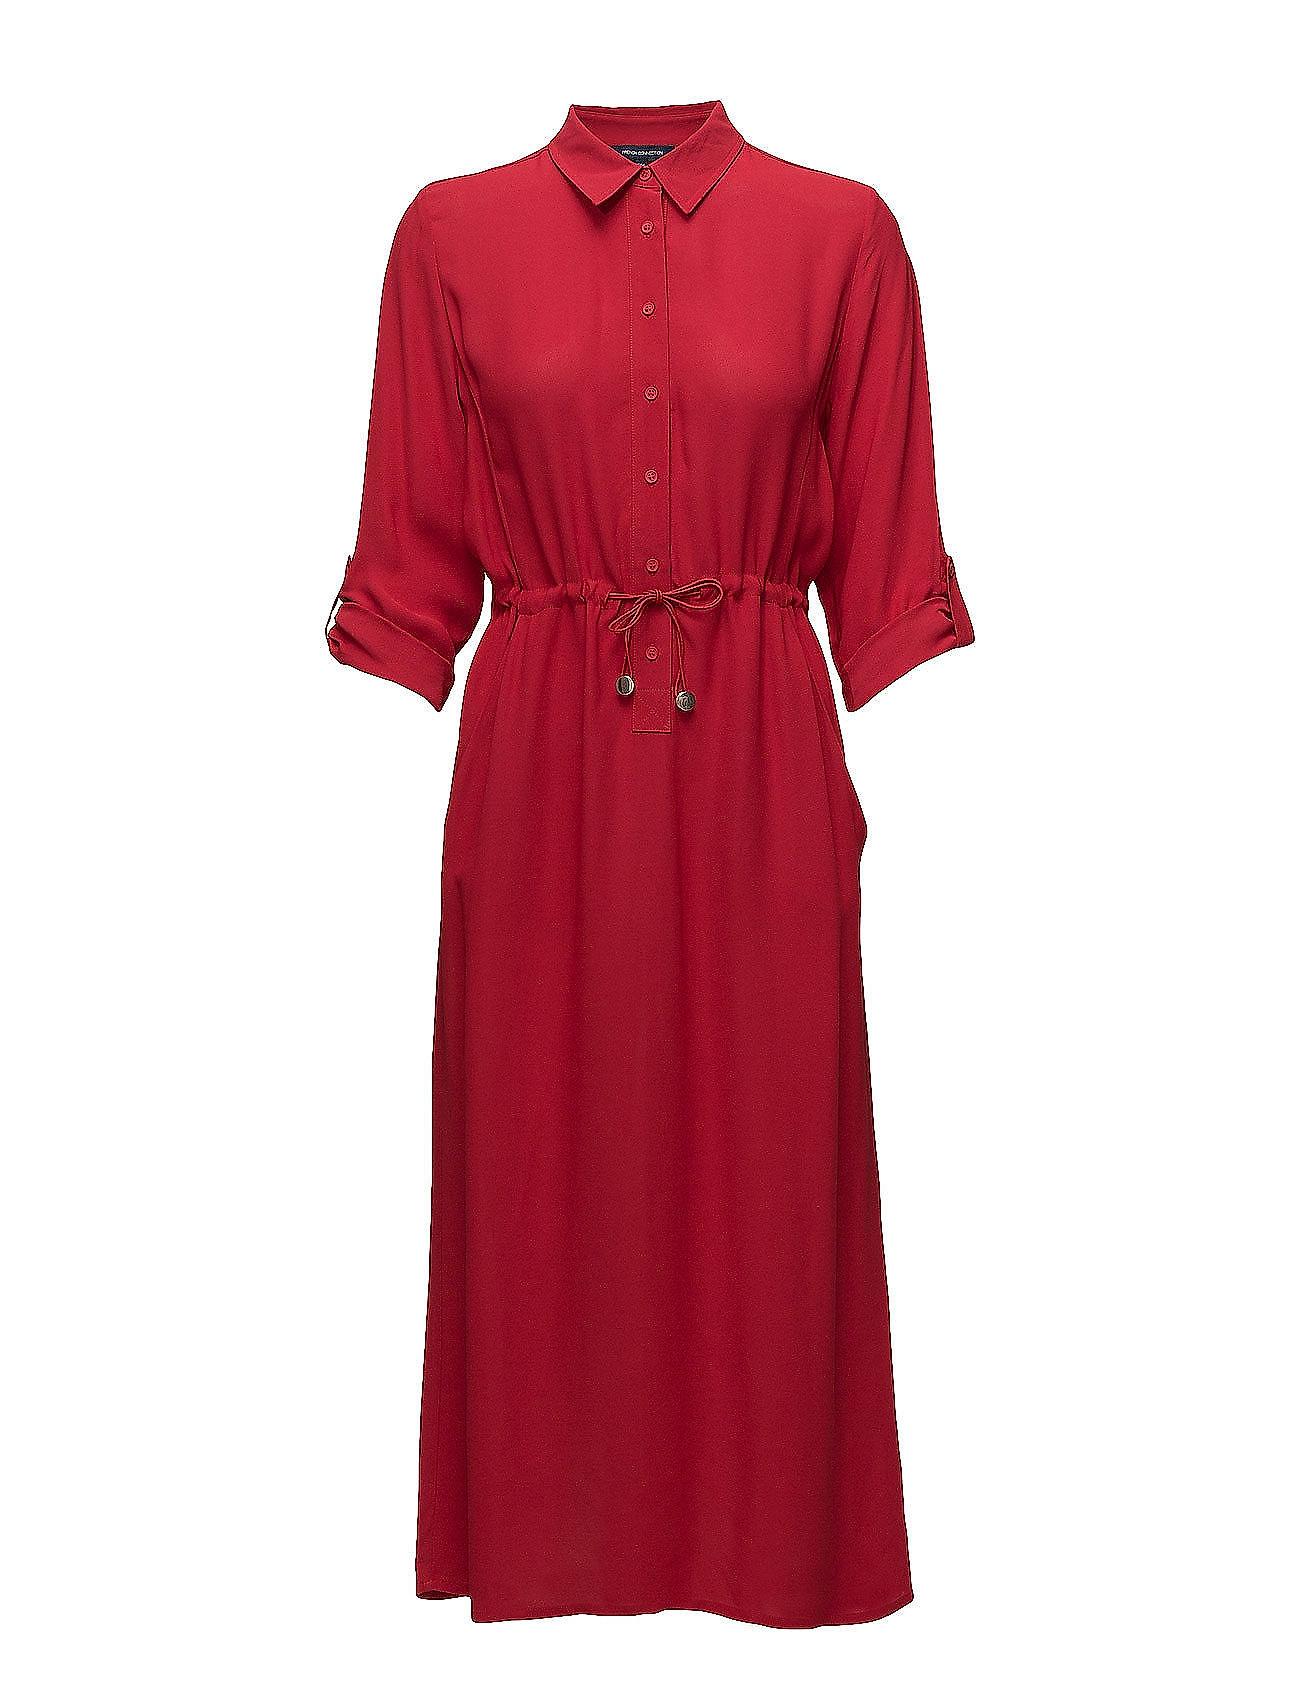 Cecil drape 3 4 sleeve mavi shirt dress blazer red 140 for French connection shirt dress